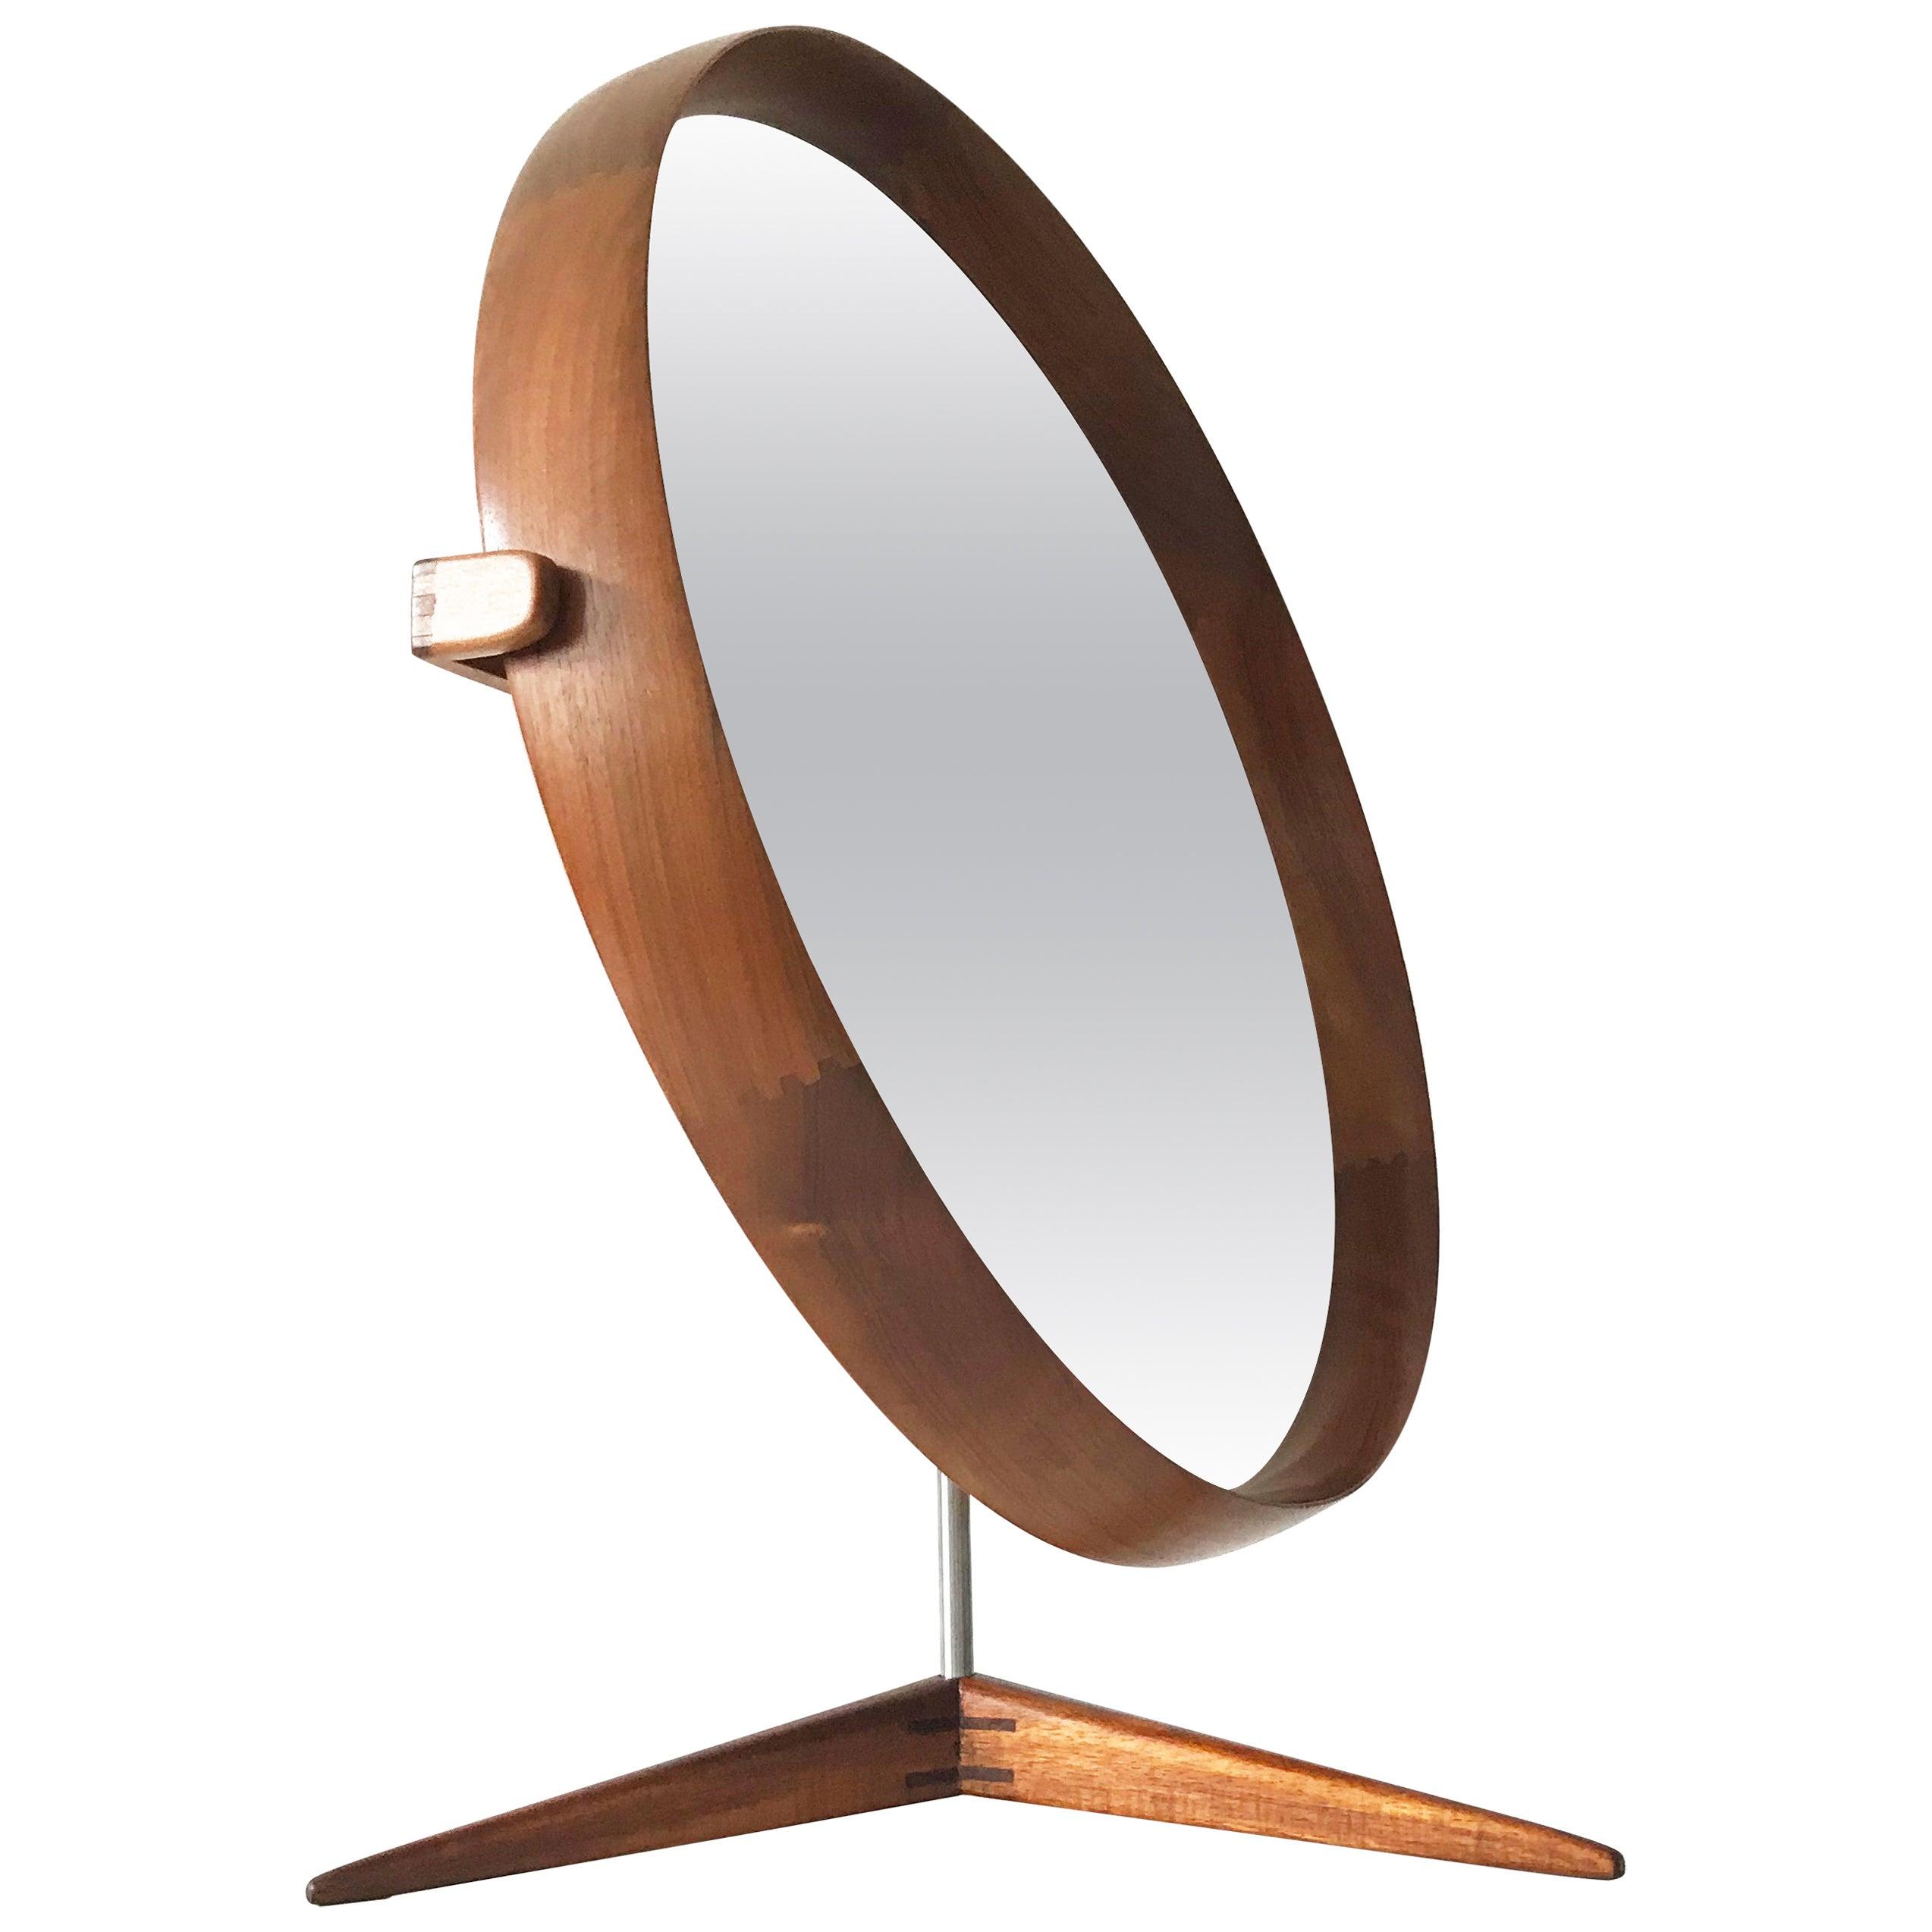 Large Teak Table Mirror by Uno & Östen Kristiansson for Luxus, Sweden, 1960s